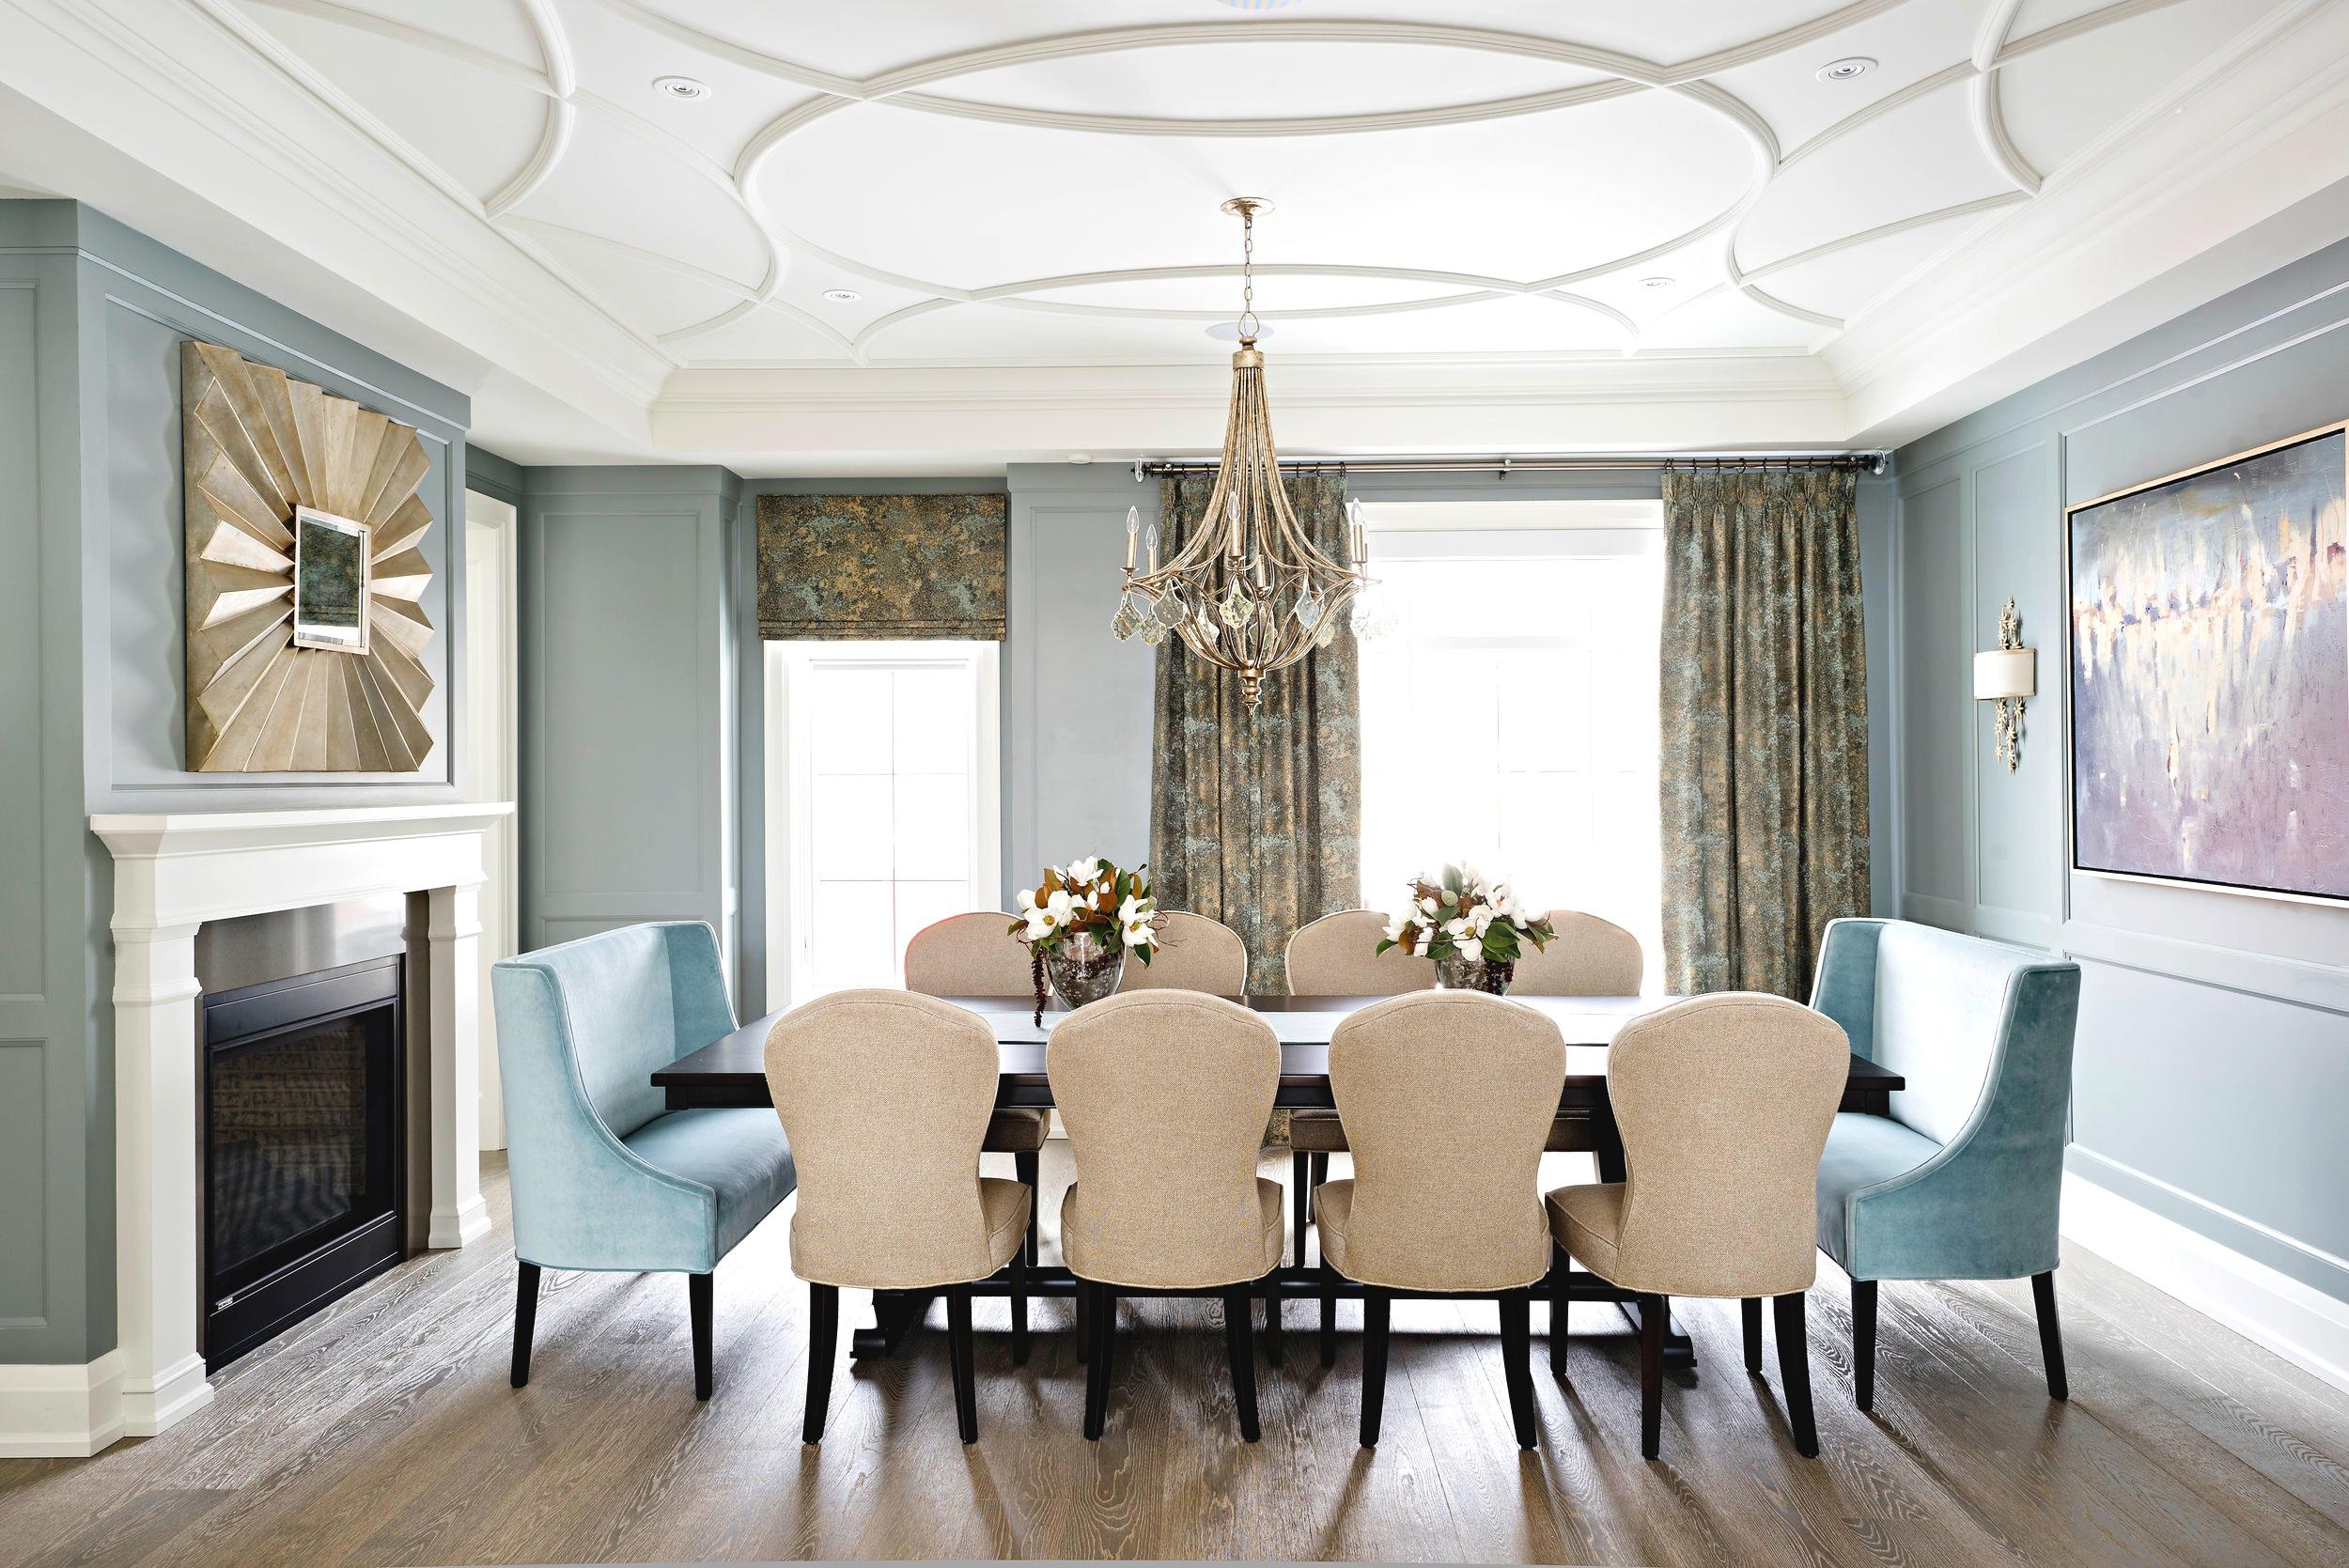 Pizzale Design Interior Design Cozy Dining Room Large Table Custom Ceiling Detail Drapery.jpg